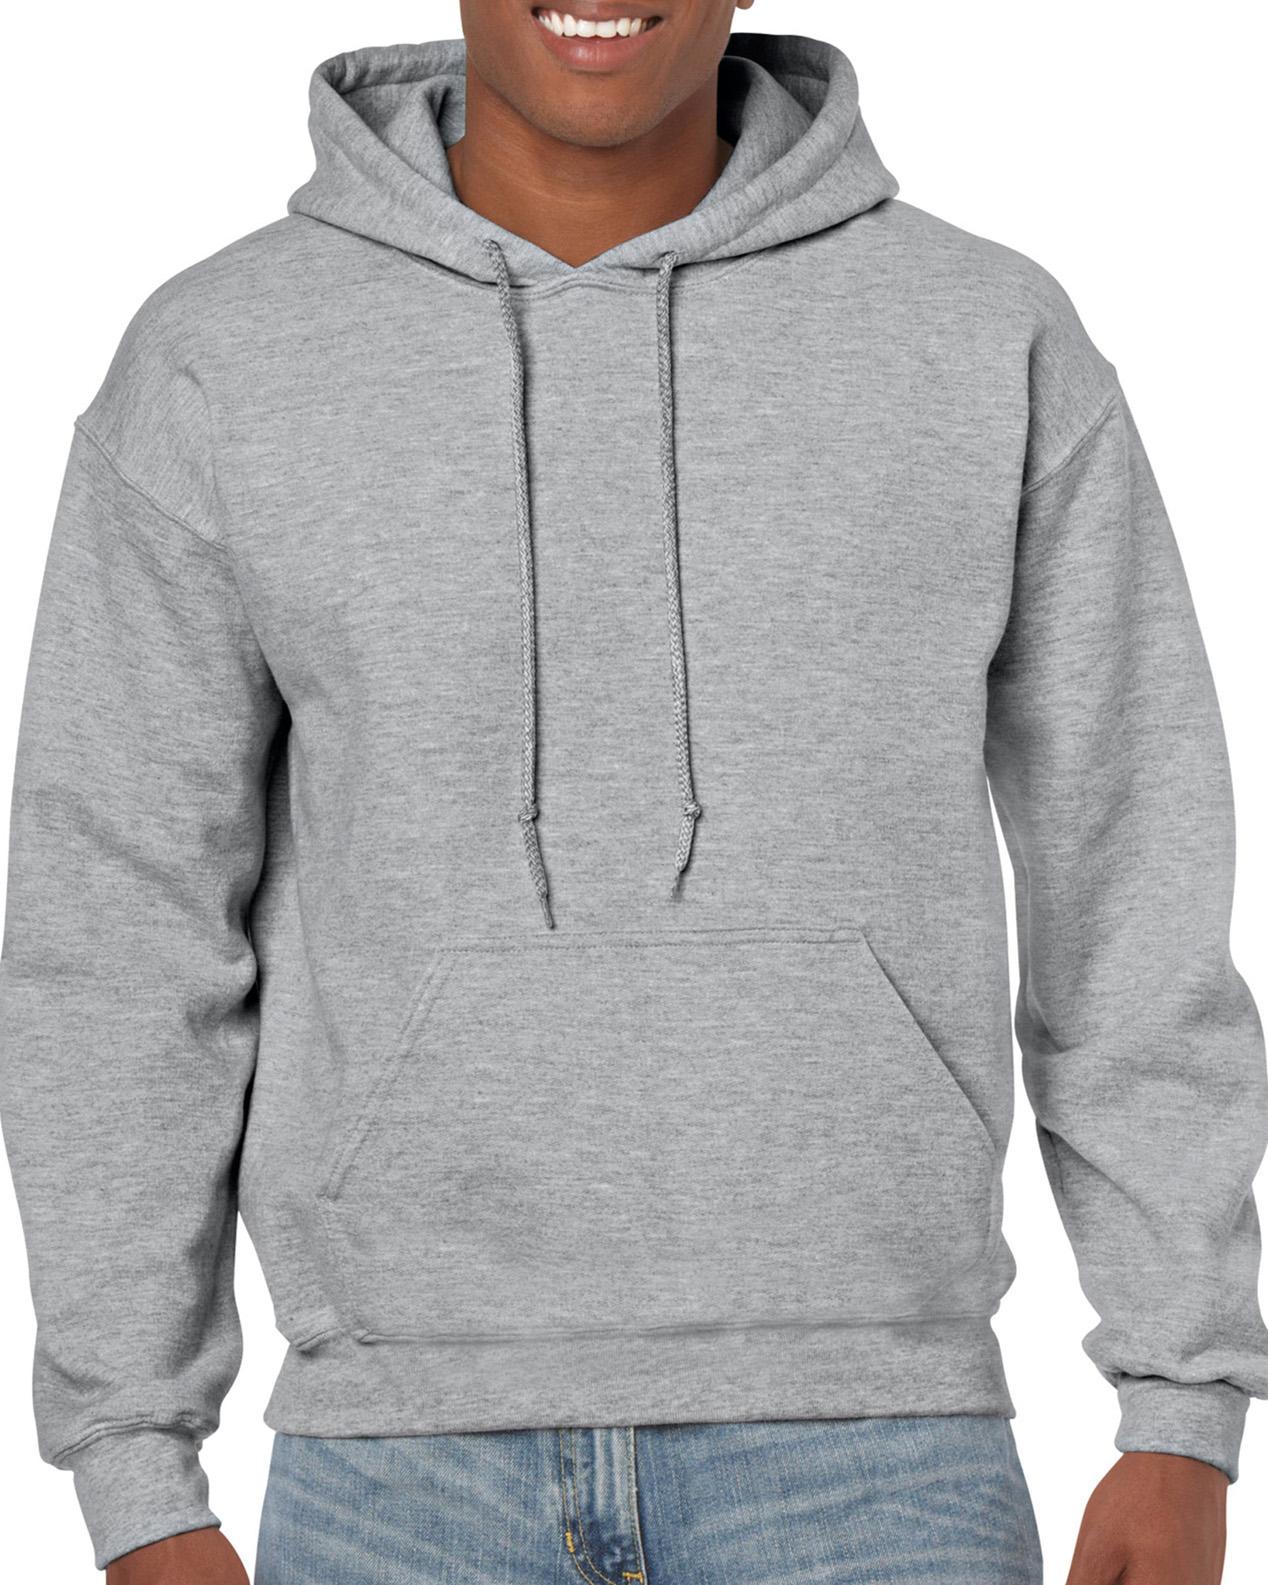 Gildan Heavy Blend Adult Hooded Sweatshirt 18500